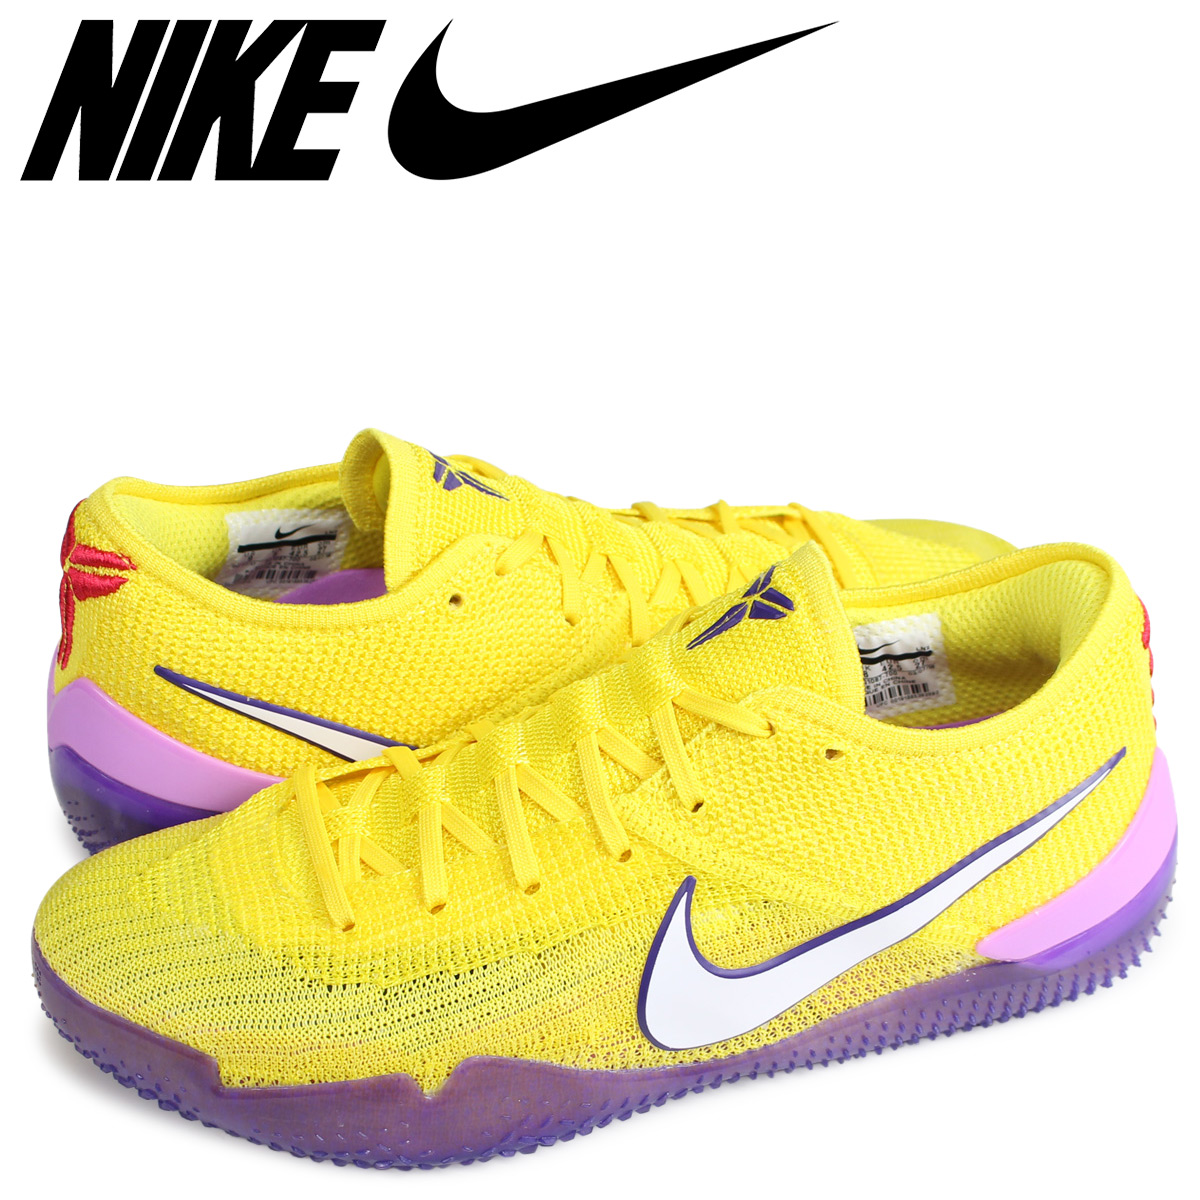 hot sale online 552cc 22a26 cheap allsports nike kobe ad nxt 360 yellow strike nike corby sneakers men  aq1087 700 yellow